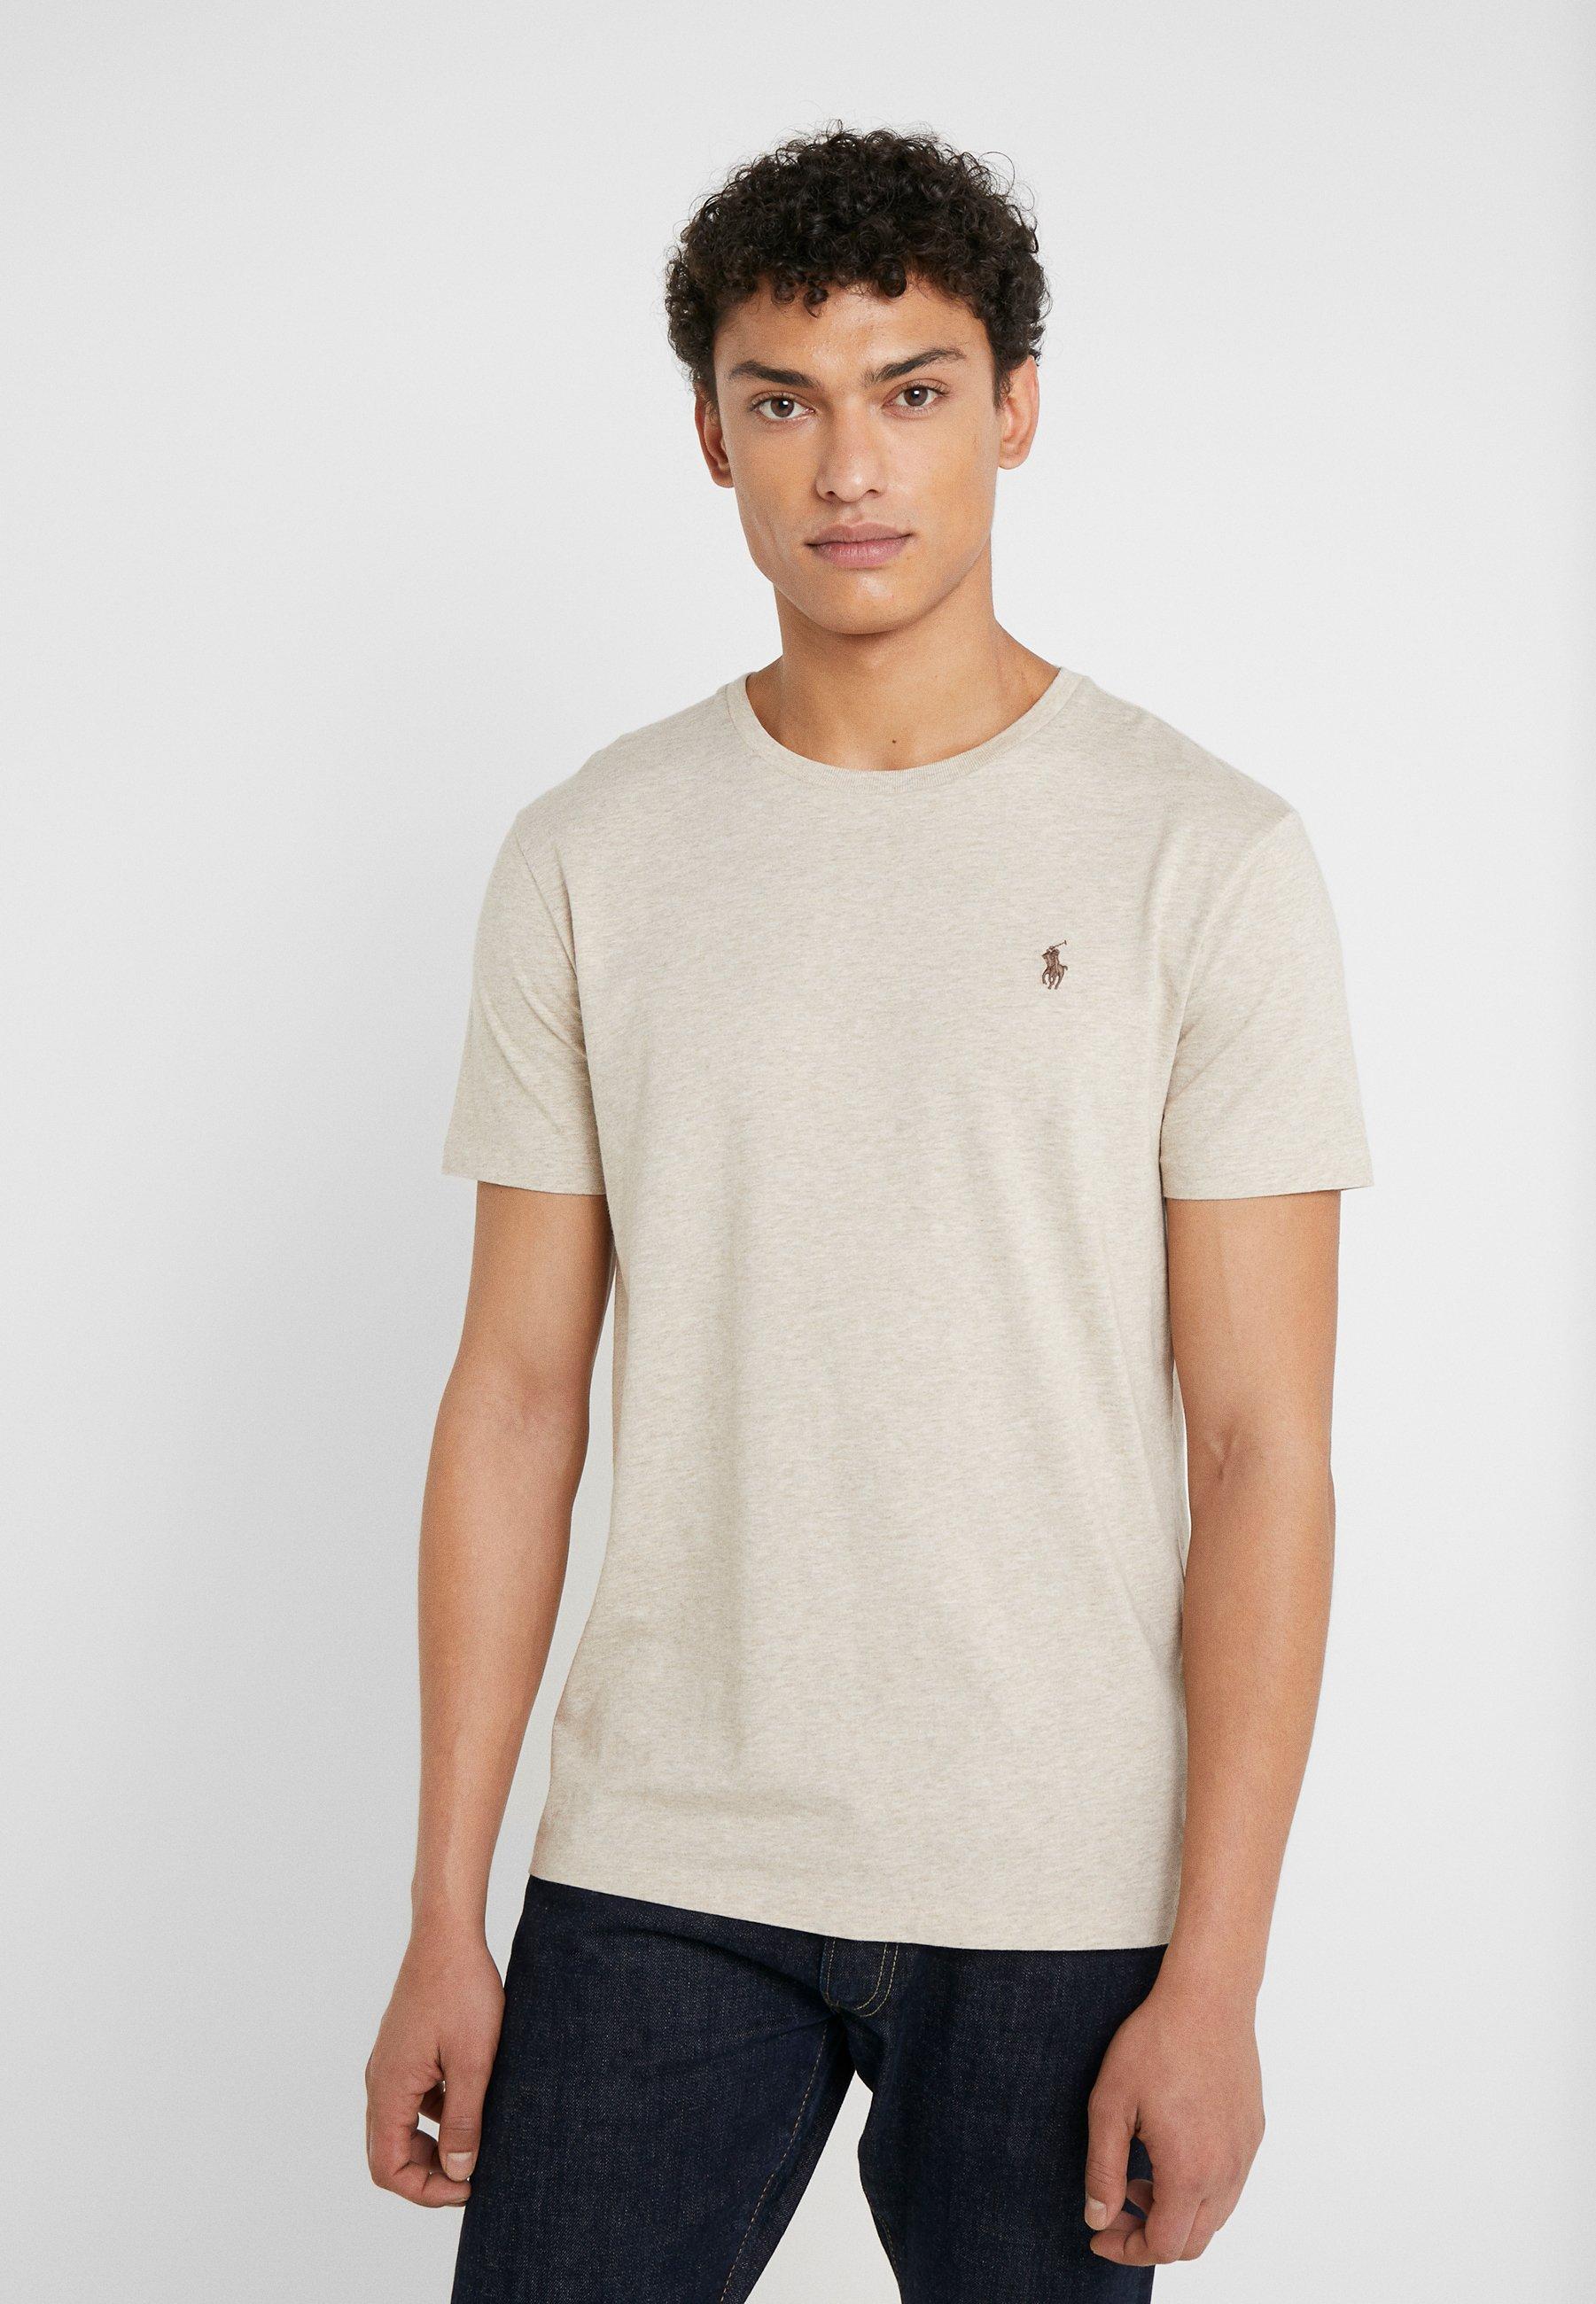 Homme CUSTOM SLIM FIT JERSEY CREWNECK T-SHIRT - T-shirt basique - expedition dune